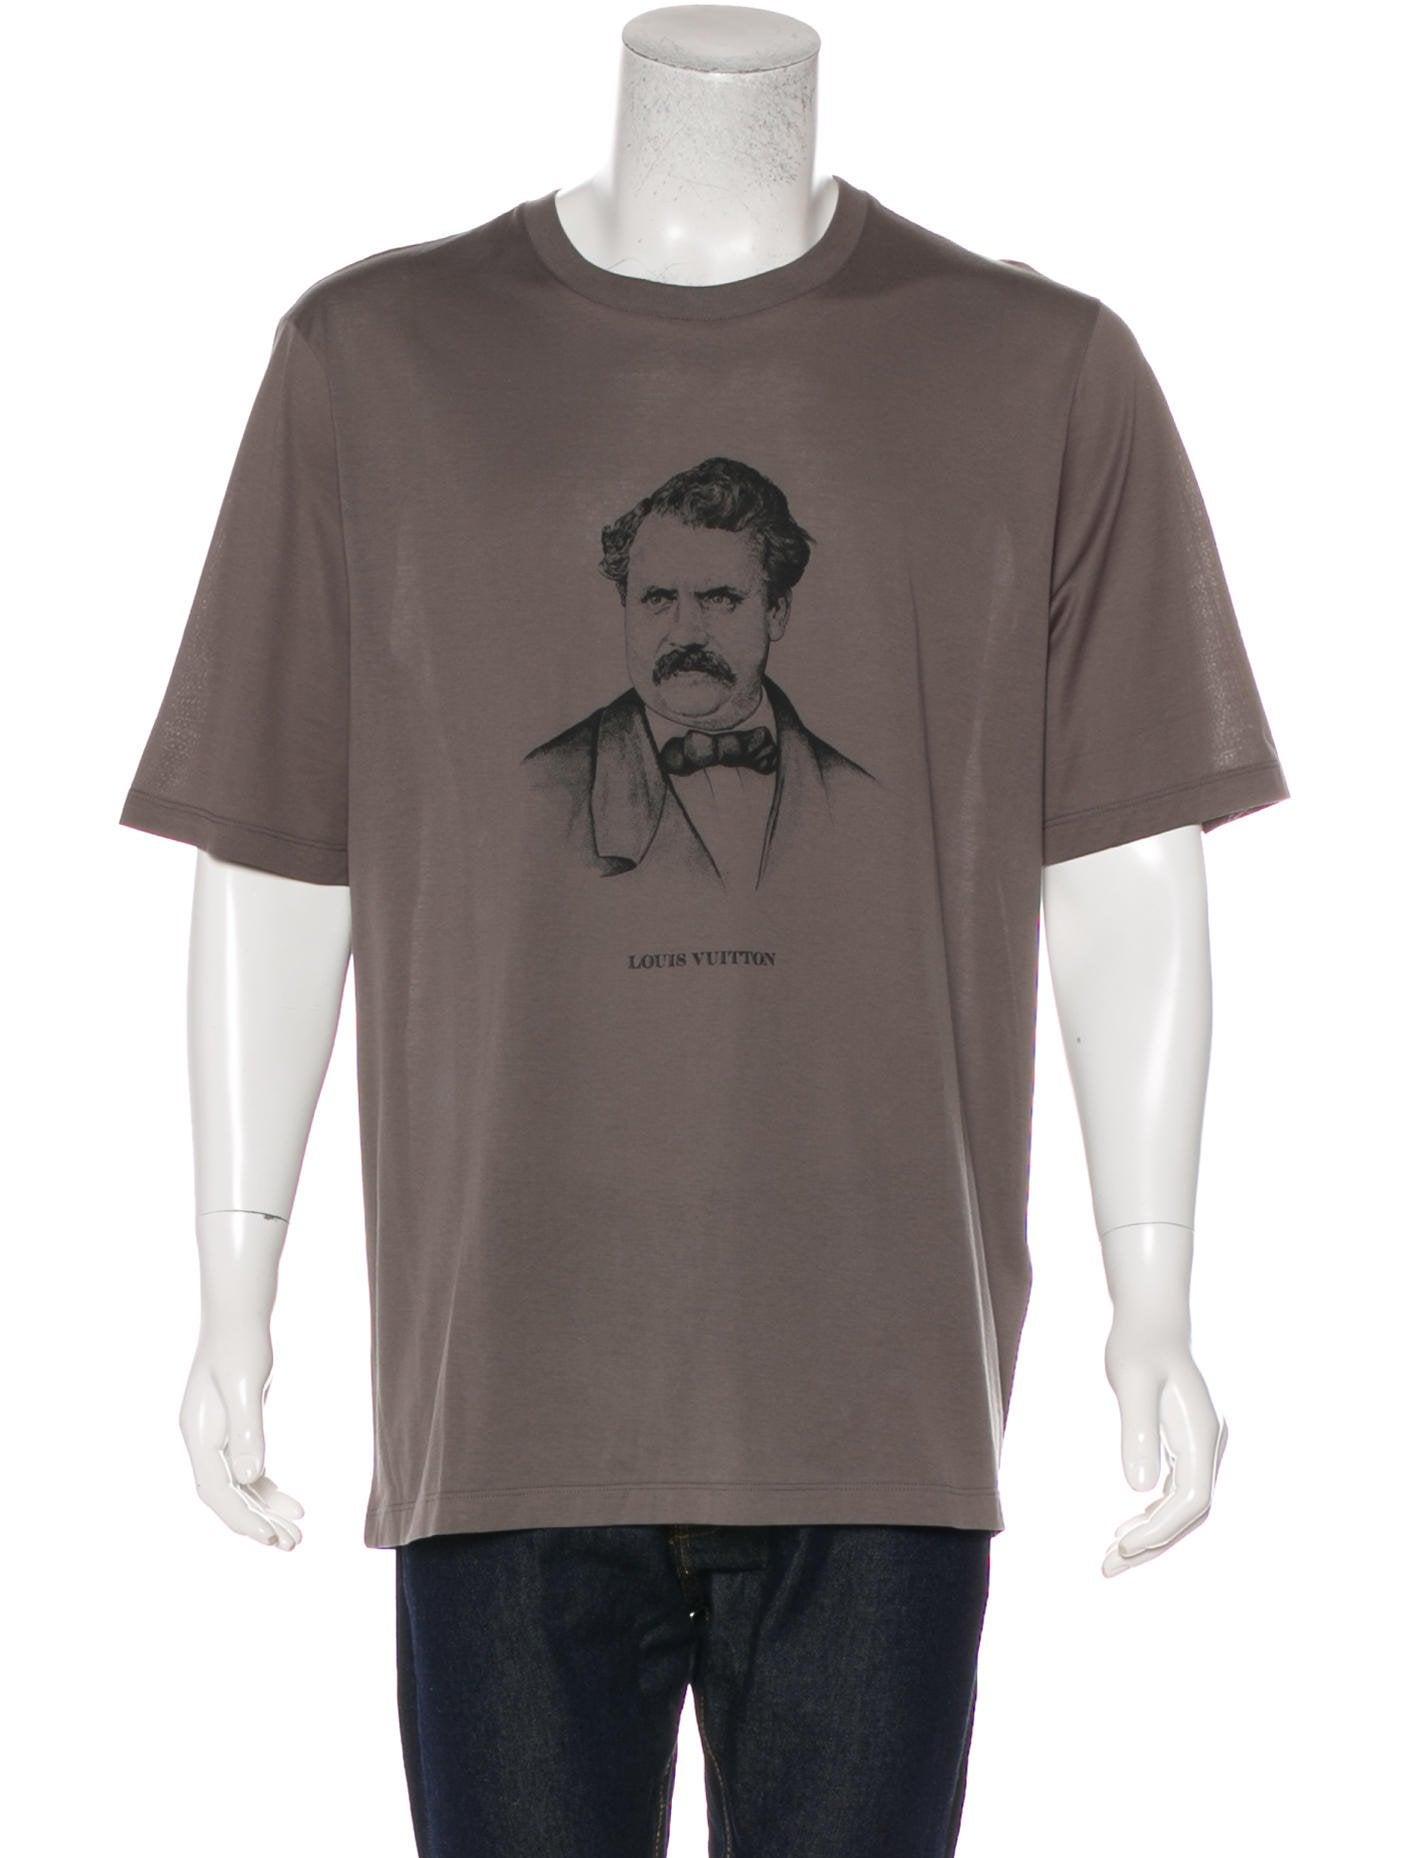 1e59a663a348 Louis Vuitton Graphic T-Shirt w  Tags - Clothing - LOU191753